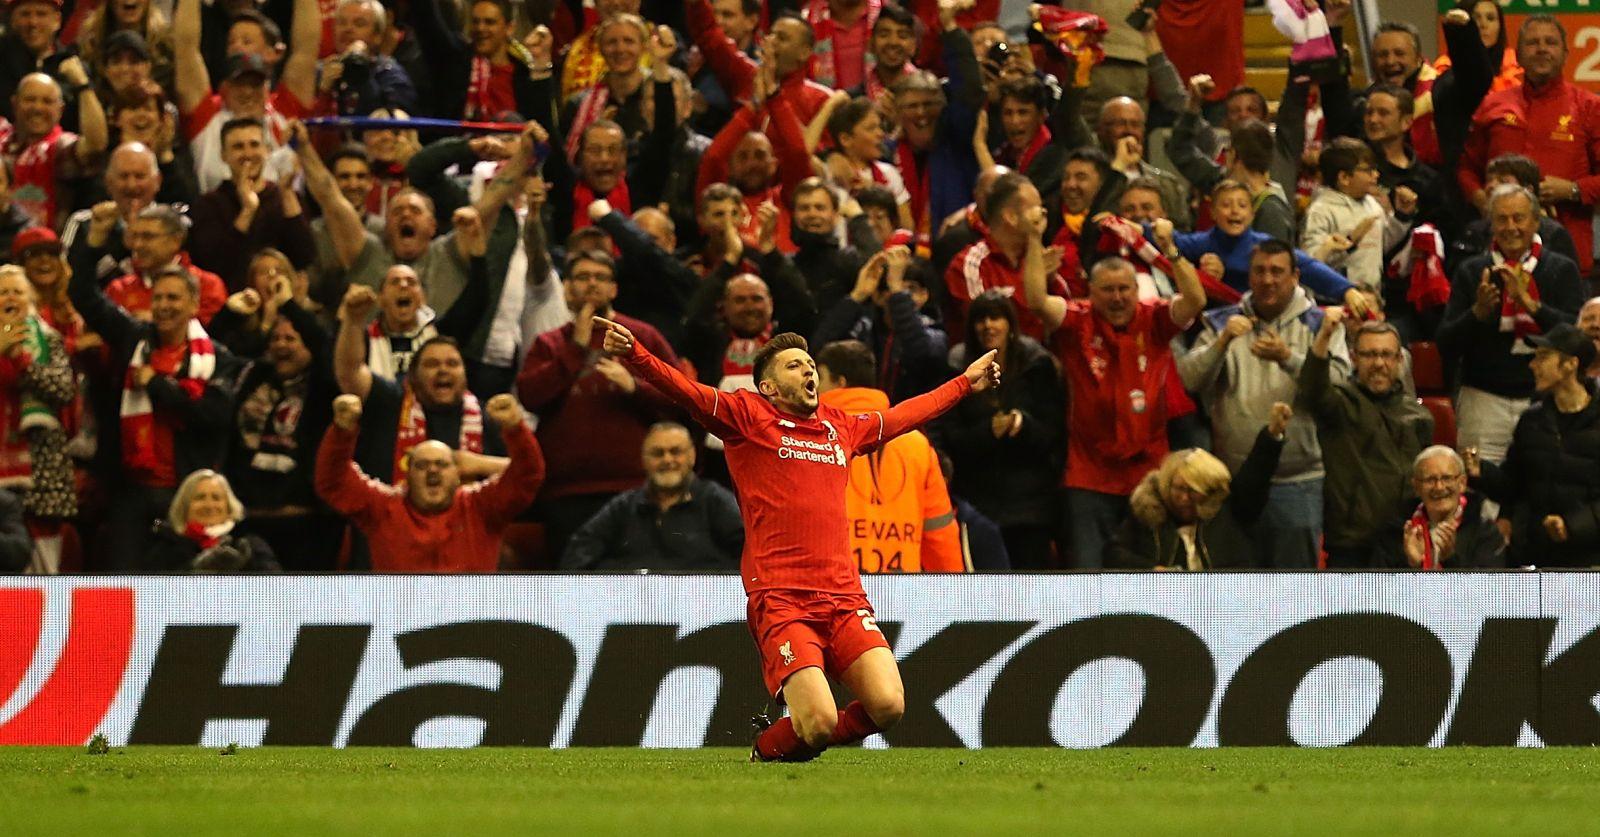 Tottenham plan $28.8m move for Liverpool midfielder Lallana